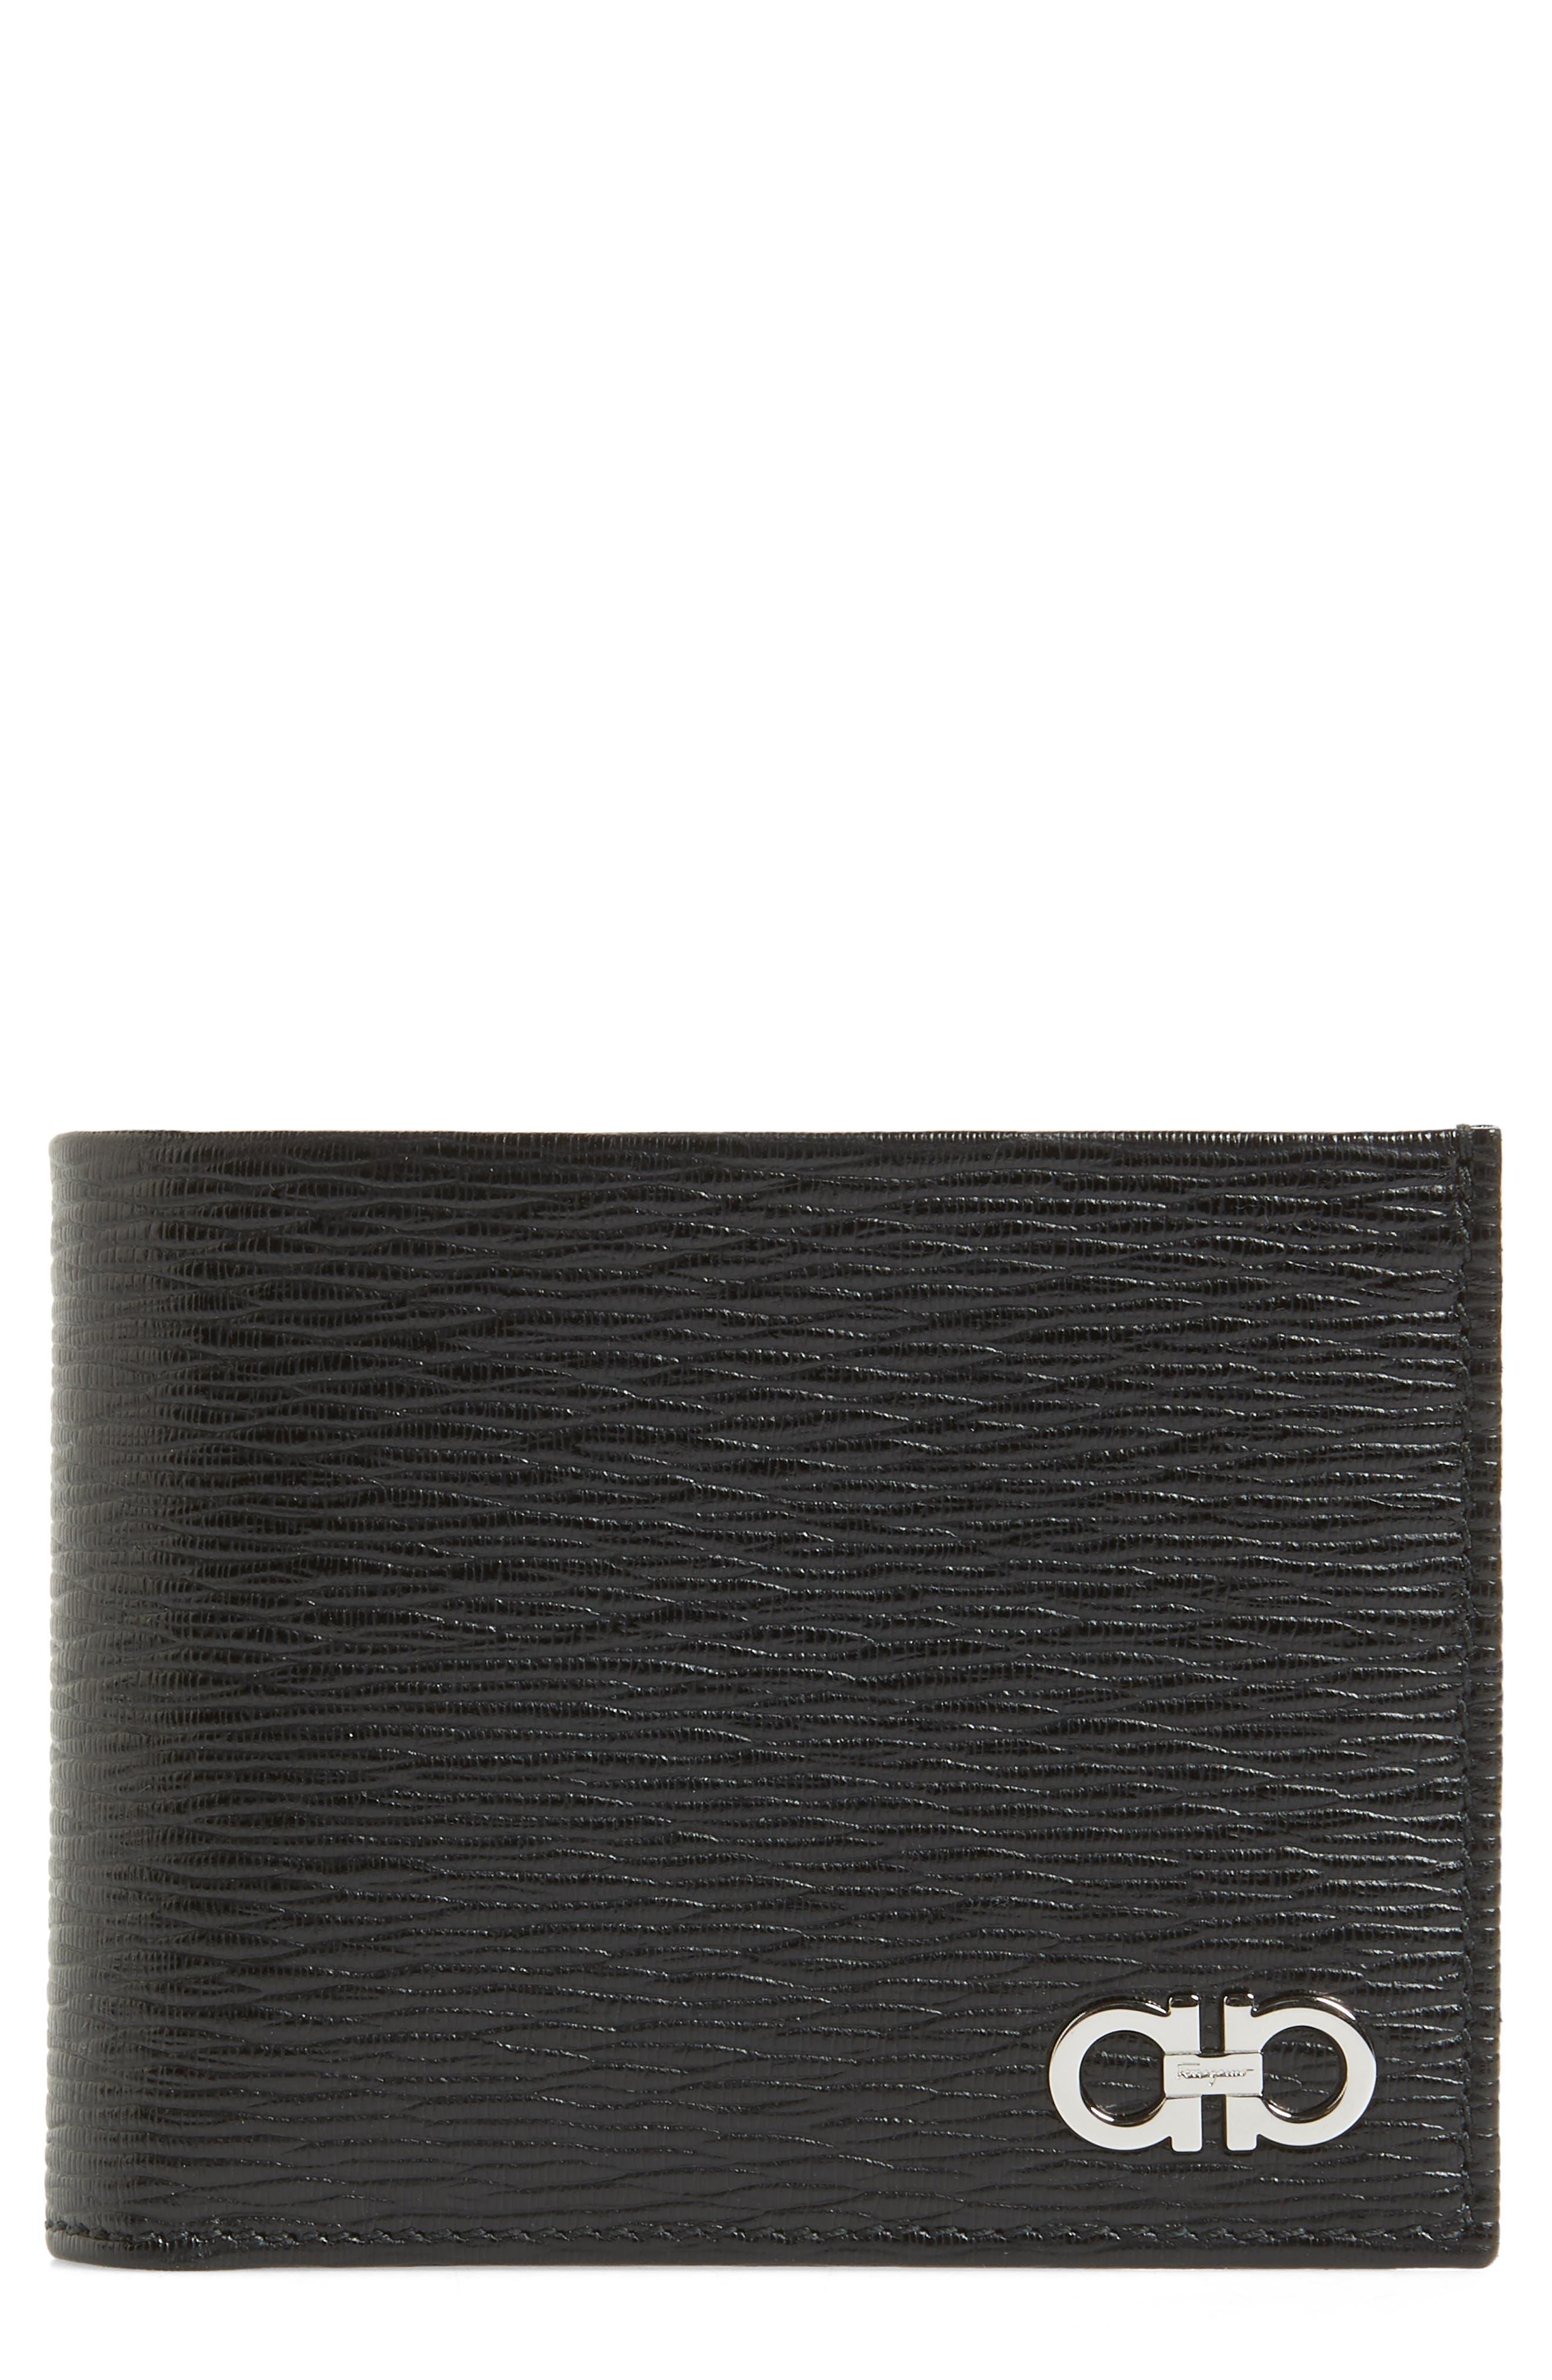 Revival Leather Card Case,                             Main thumbnail 1, color,                             BLACK